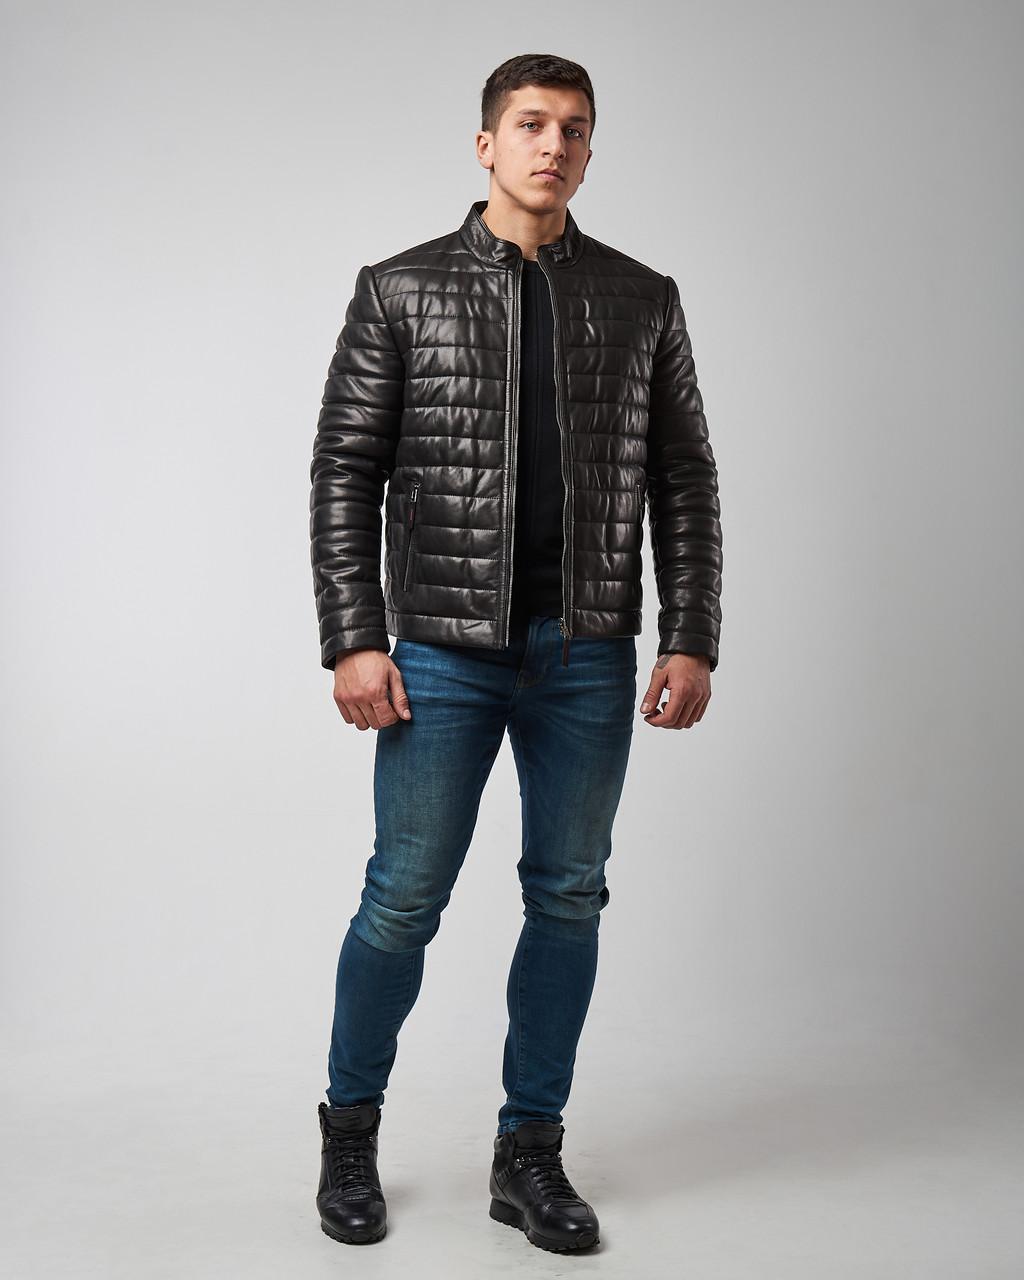 Куртка кожаная мужская двухсторонняя Maddox. Турция